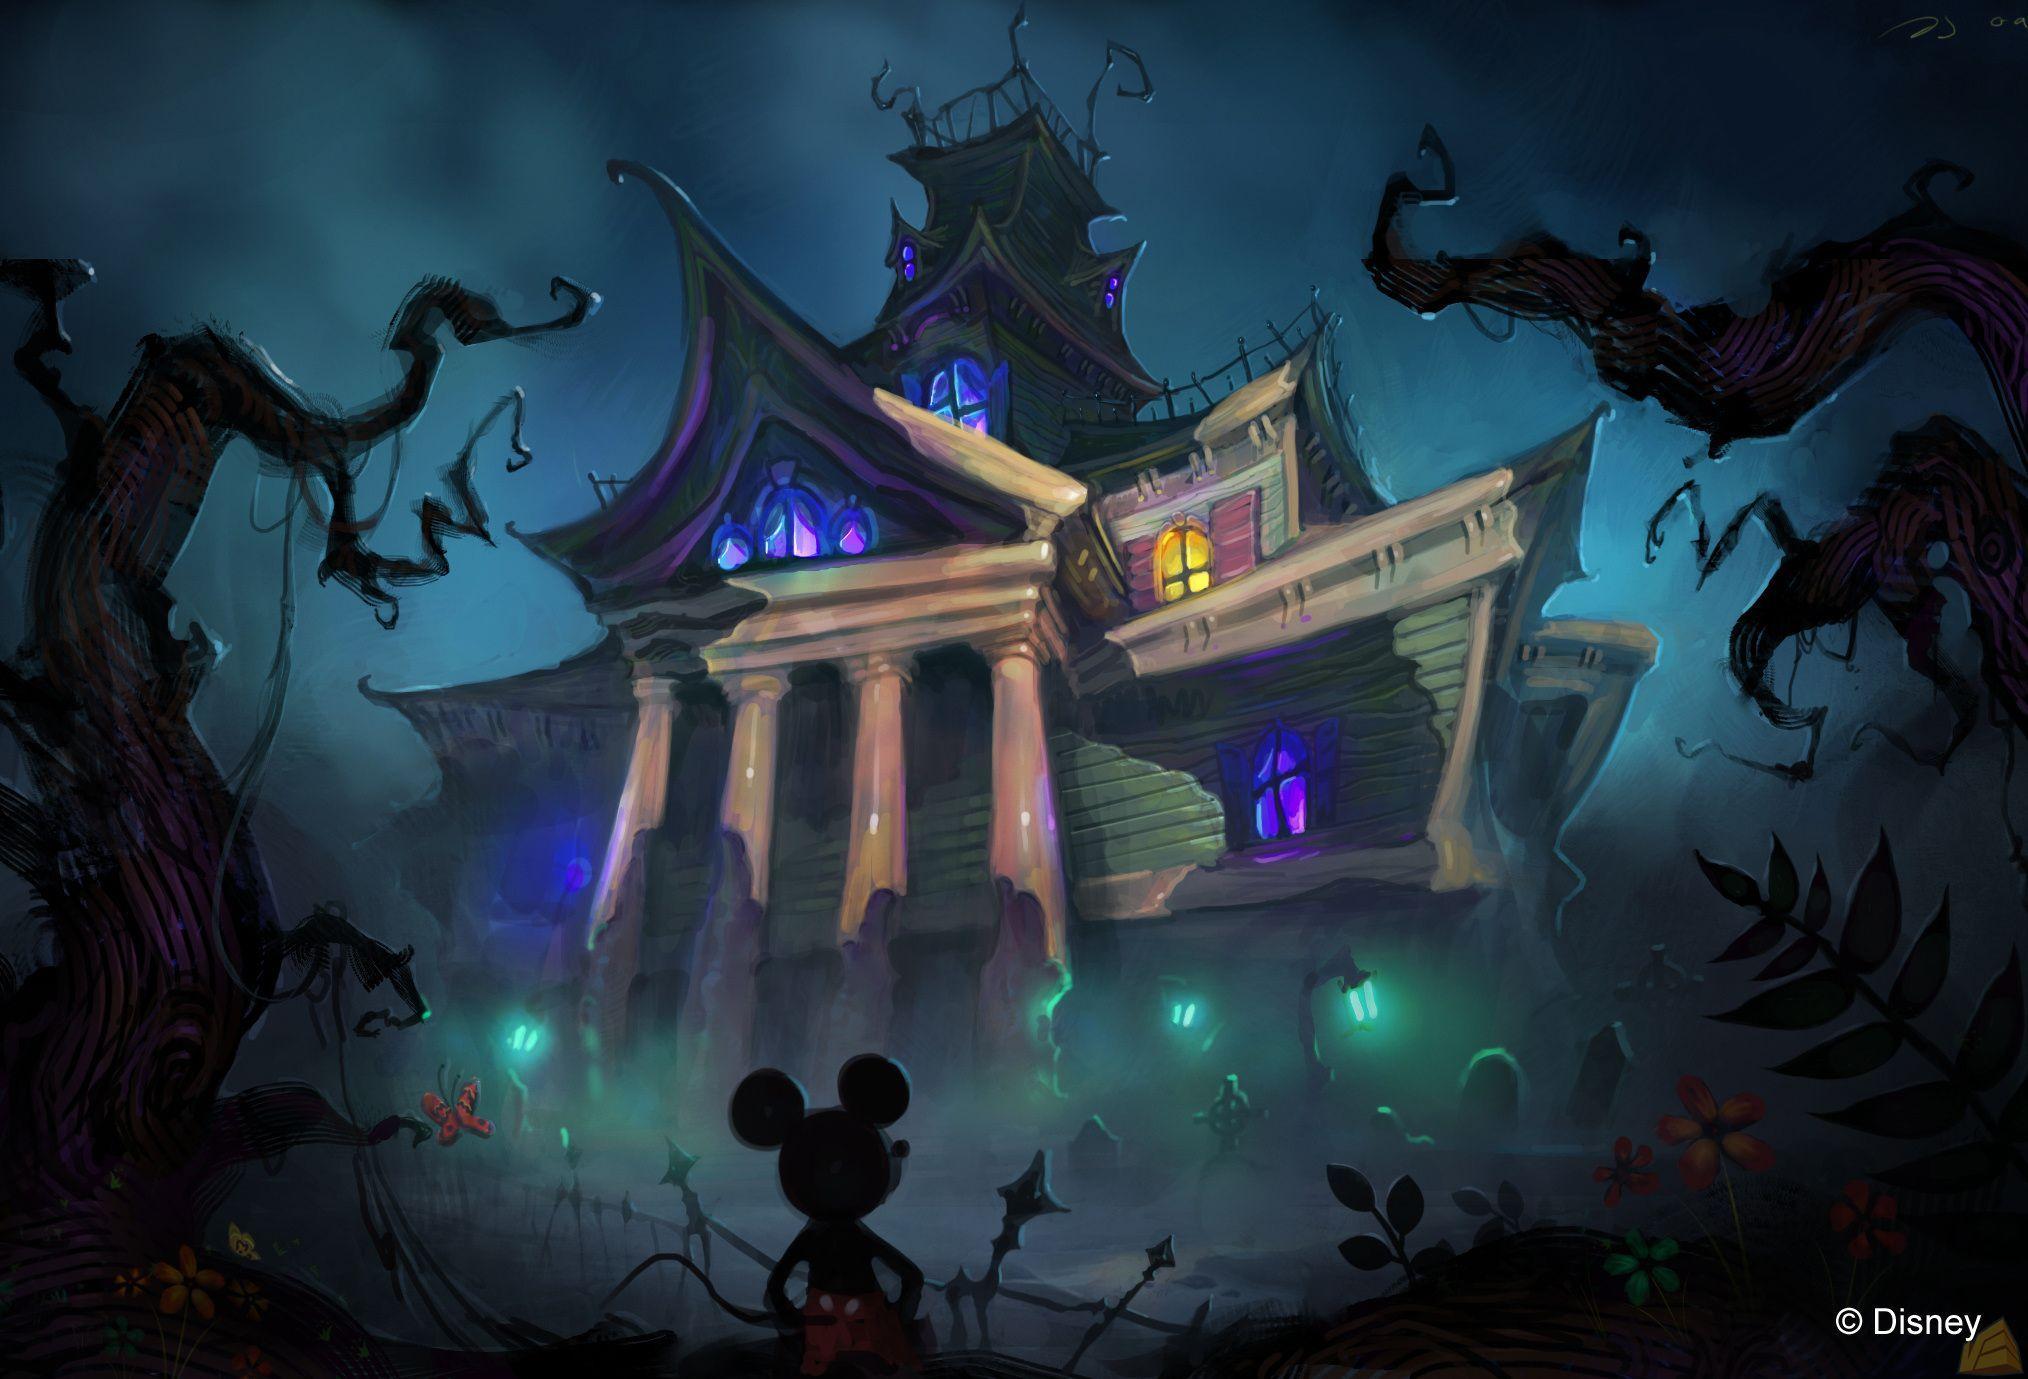 Popular Wallpaper Halloween Mickey Mouse - 28621c47cc0b769ca850739b1bb4dccb  Collection_277039.jpg